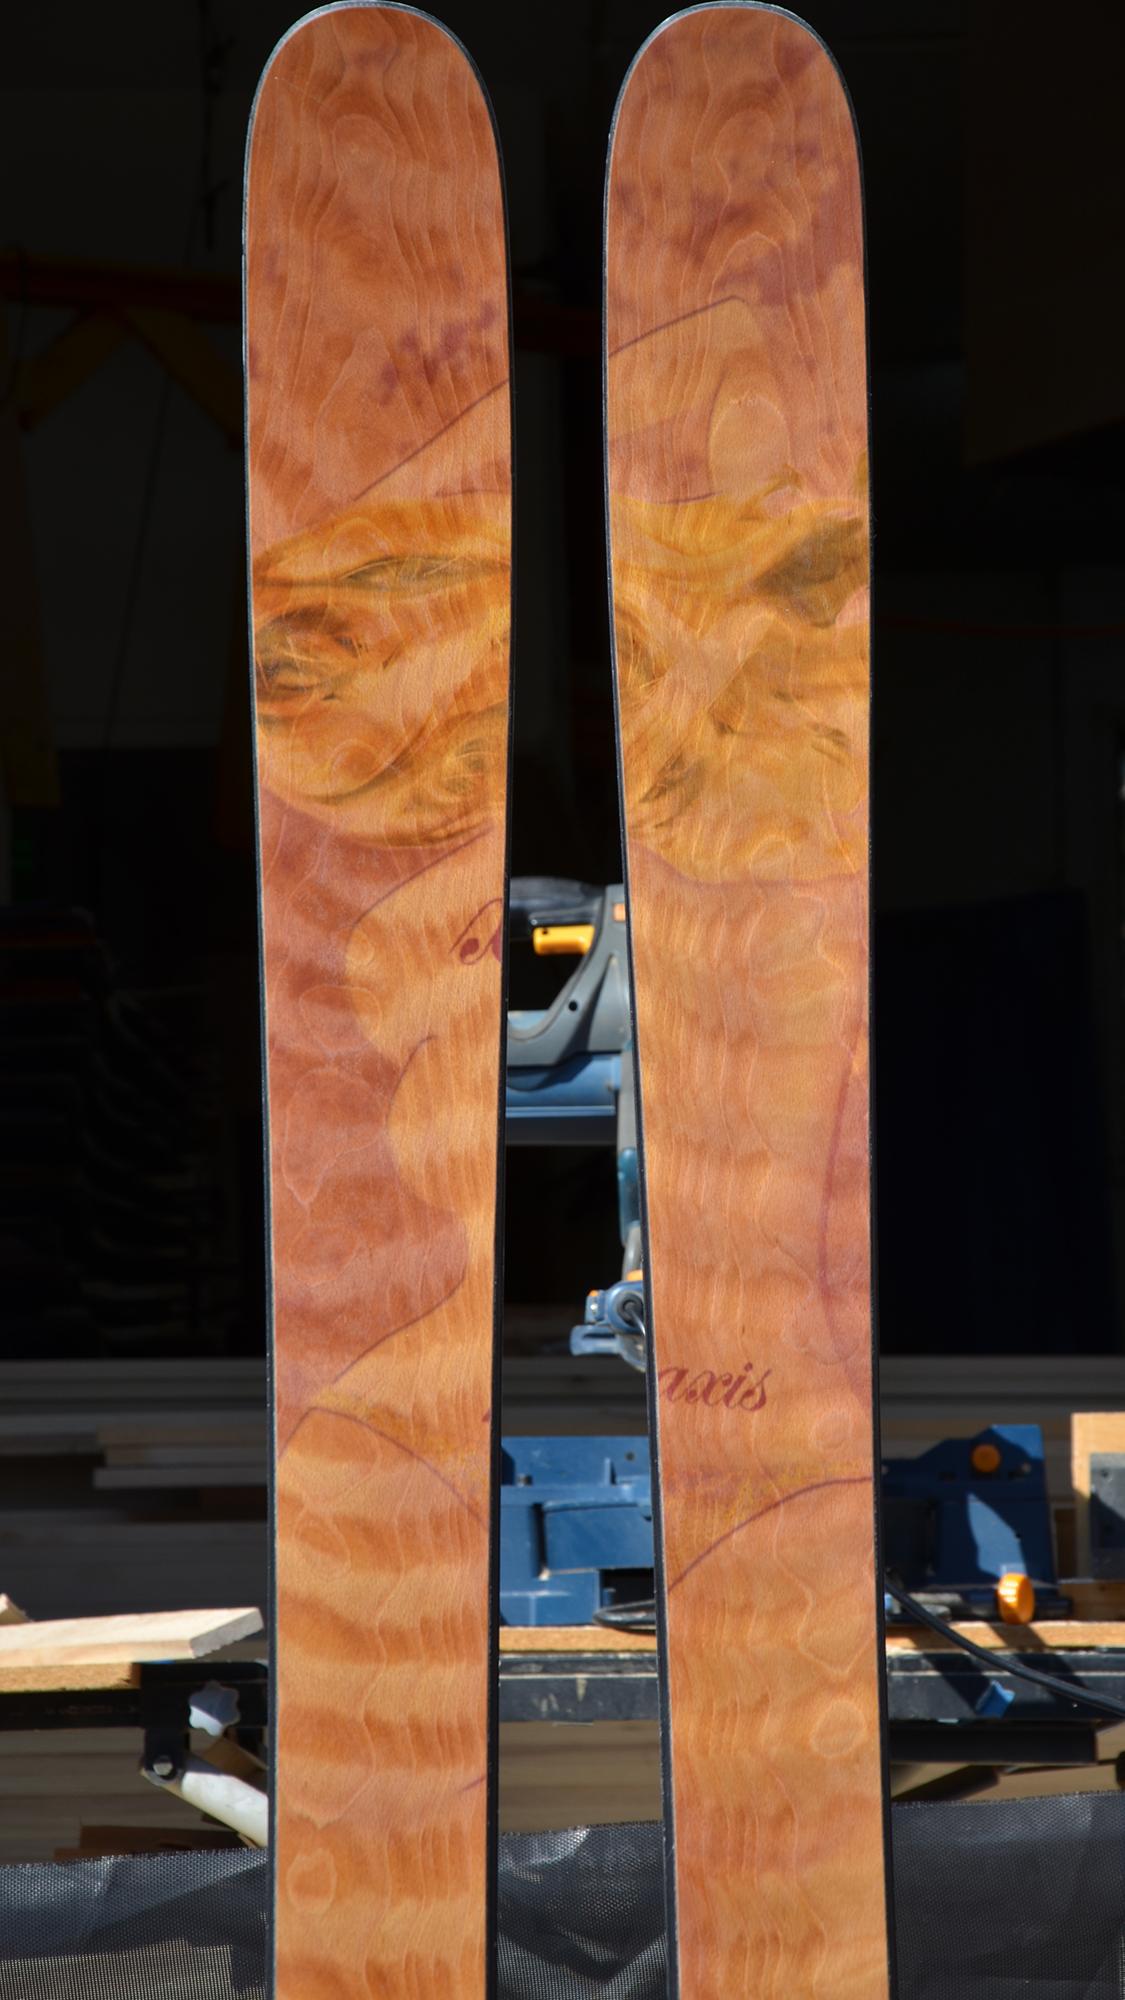 bc-custom-ski-quilted-beech-veneer-sister-t-graphic-art.jpg